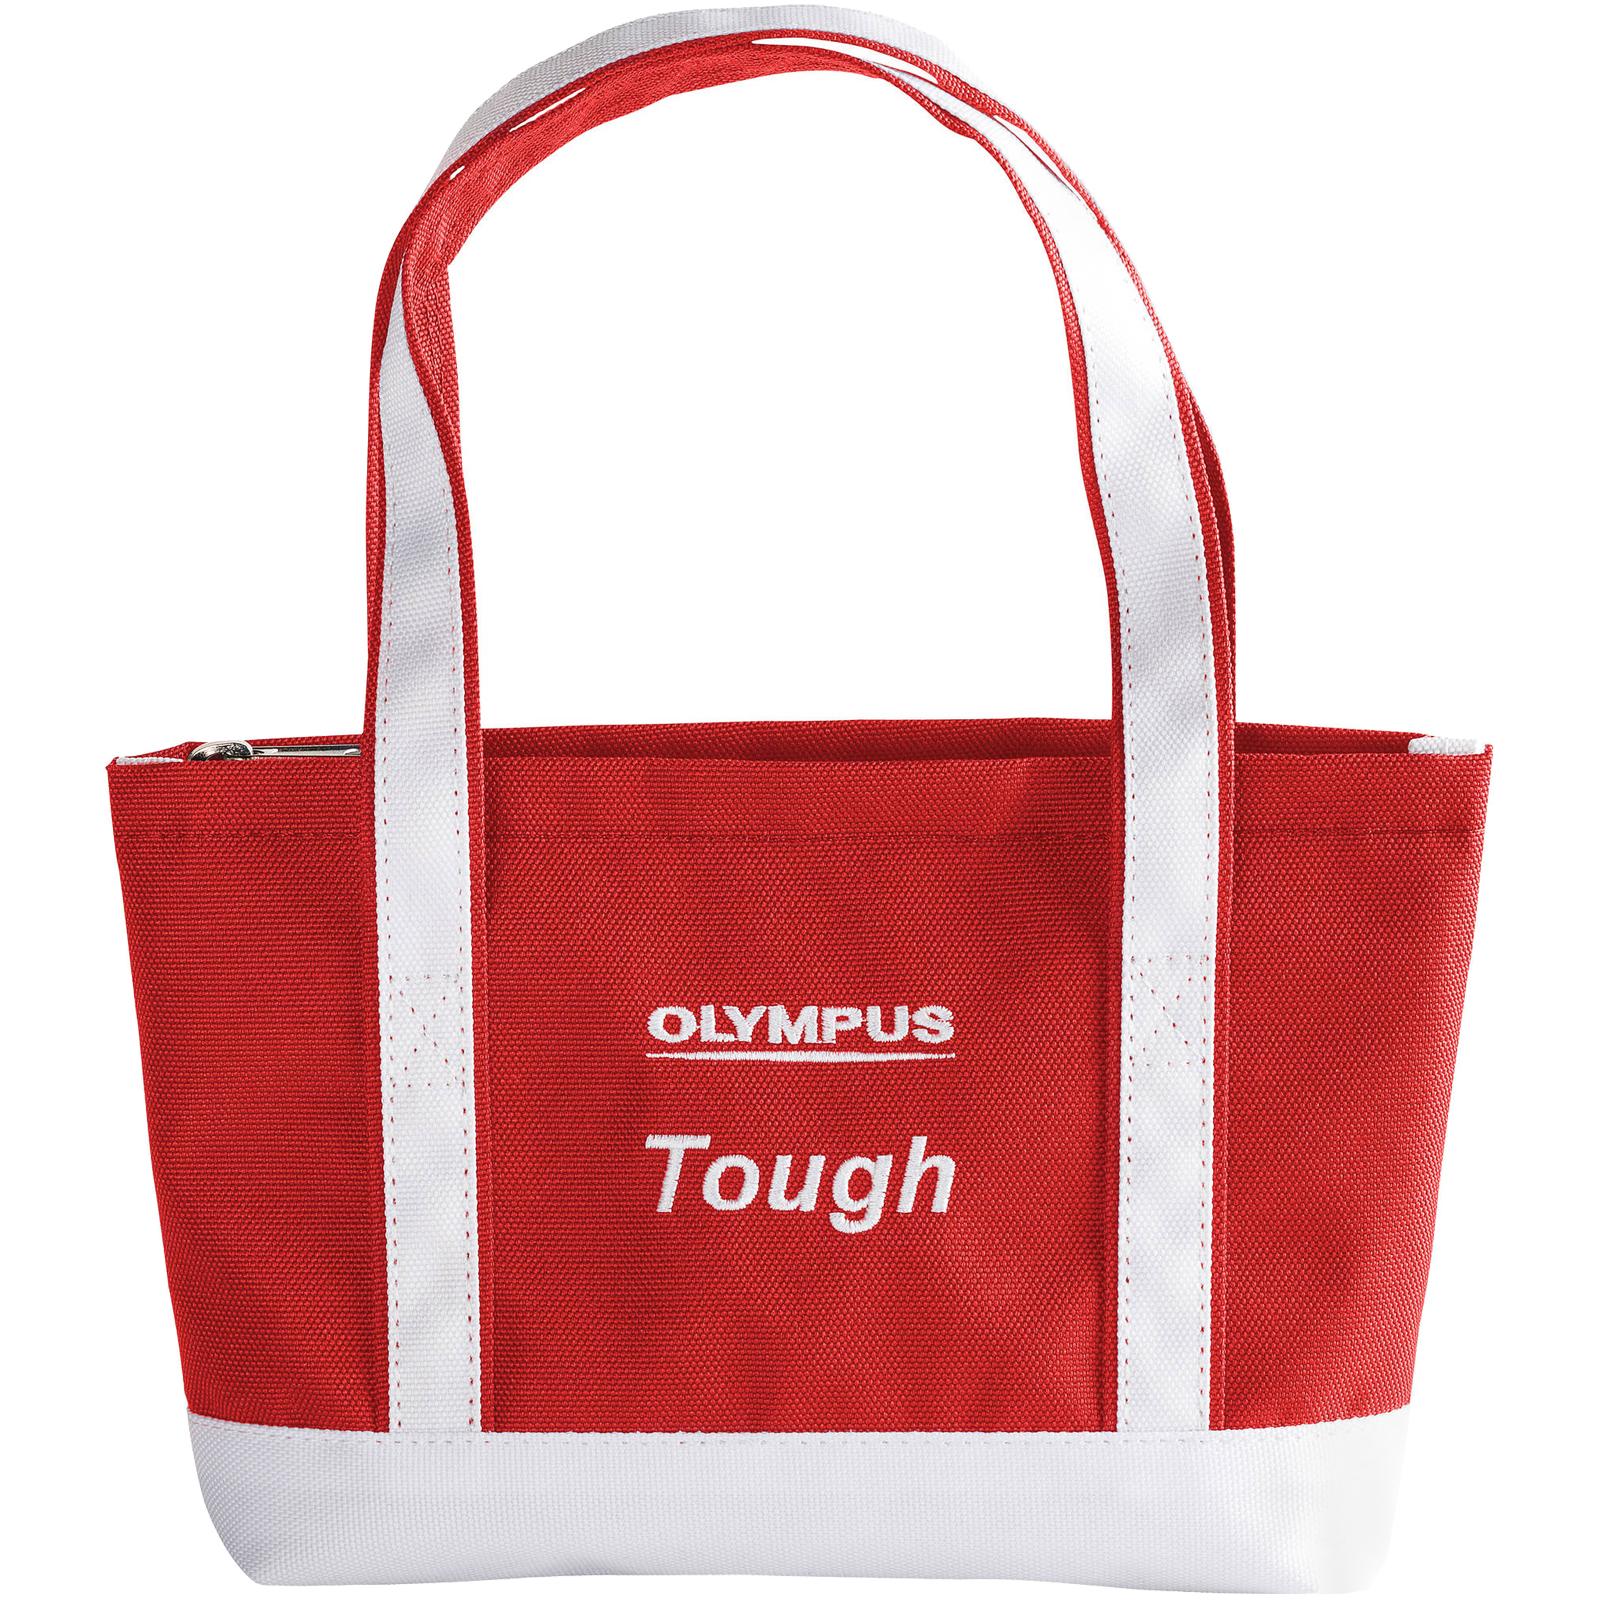 Olympus Mini Beach Bag Tough Digital Camera Case / Tote Bag (Red/White)